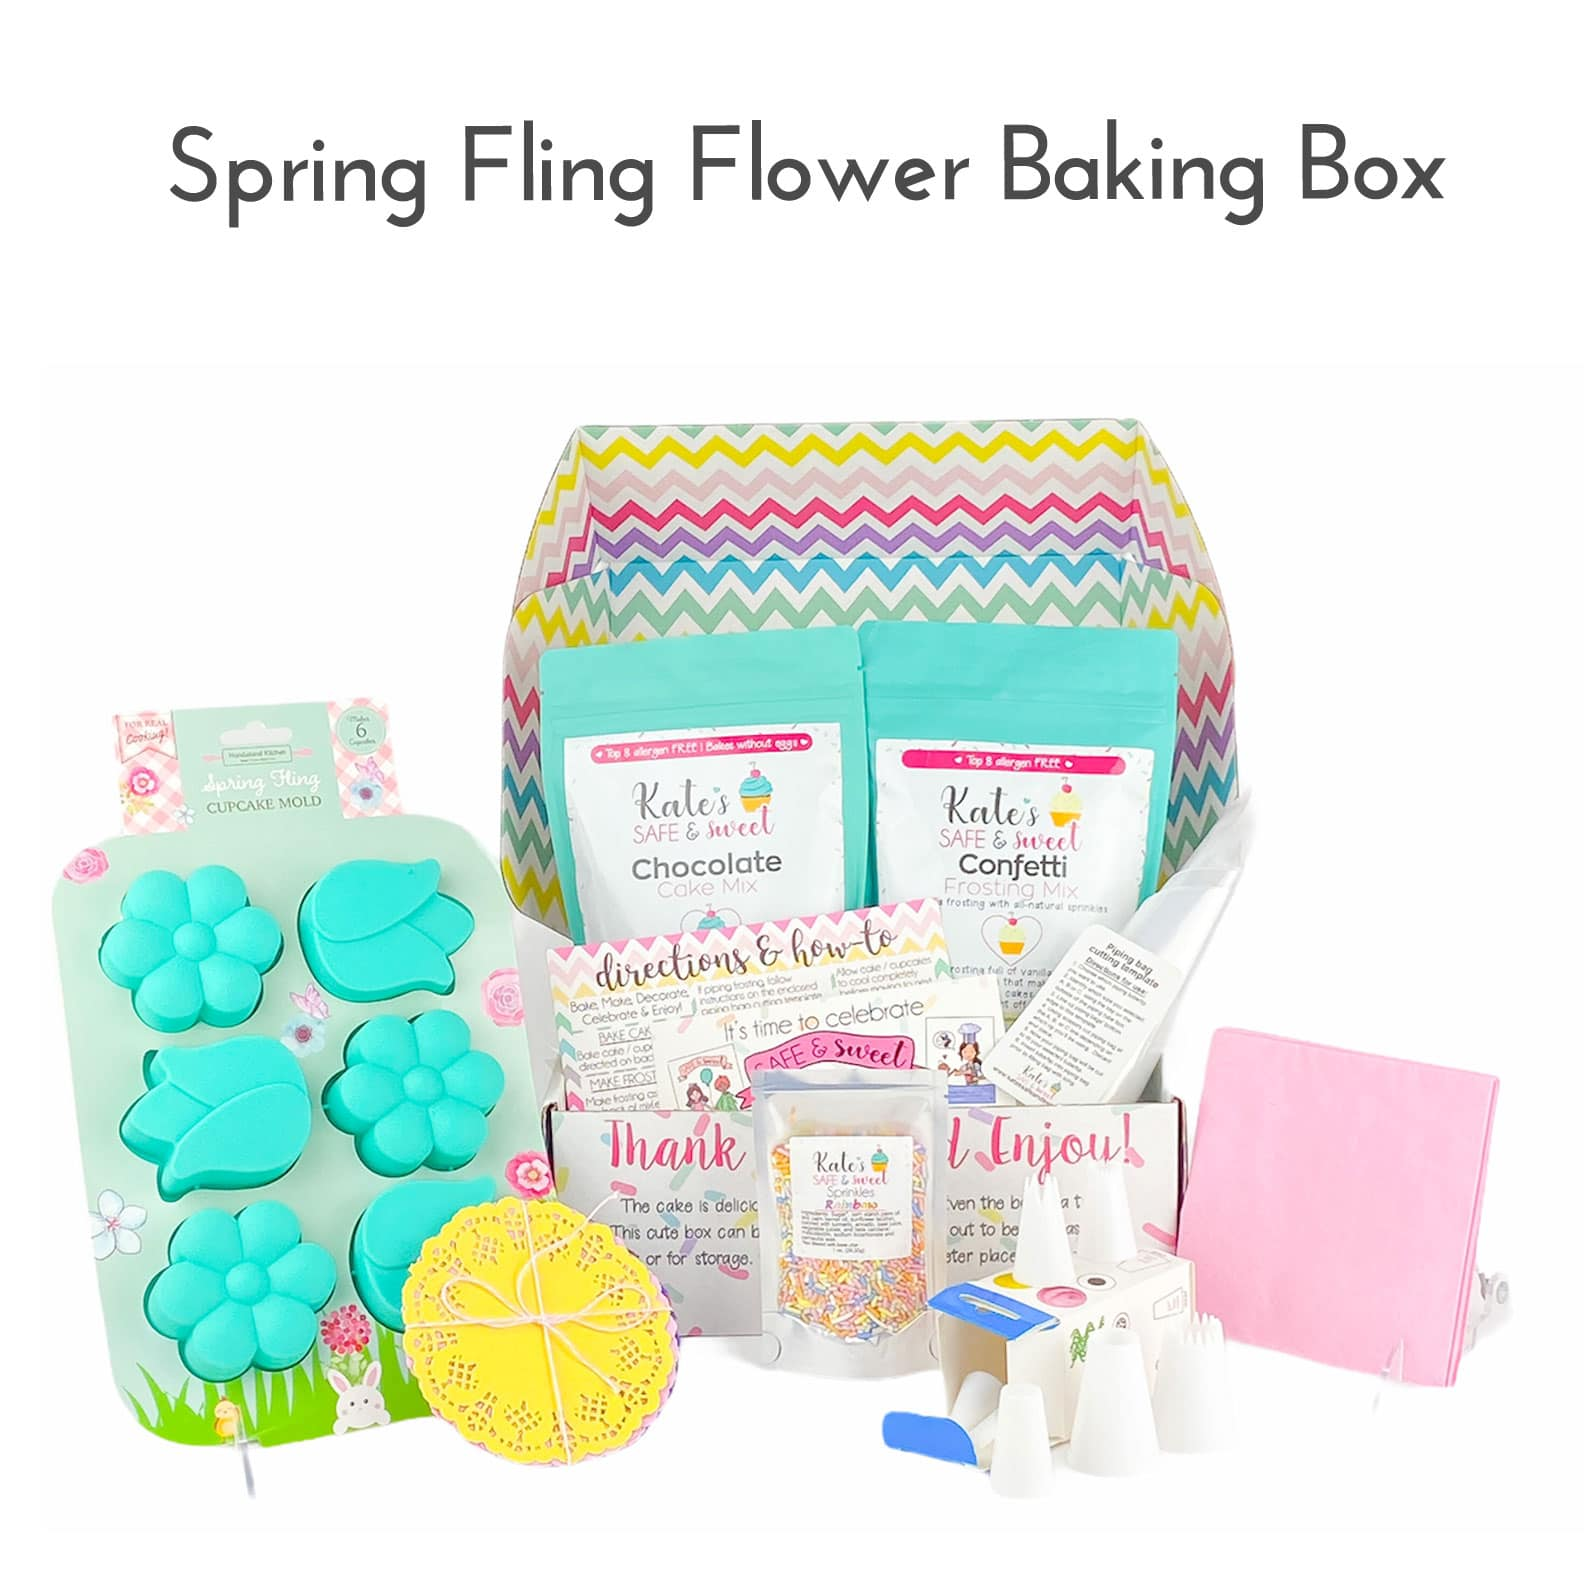 Kate's-Safe-and-Sweet---Spring-Fling-Flower-Baking-Box